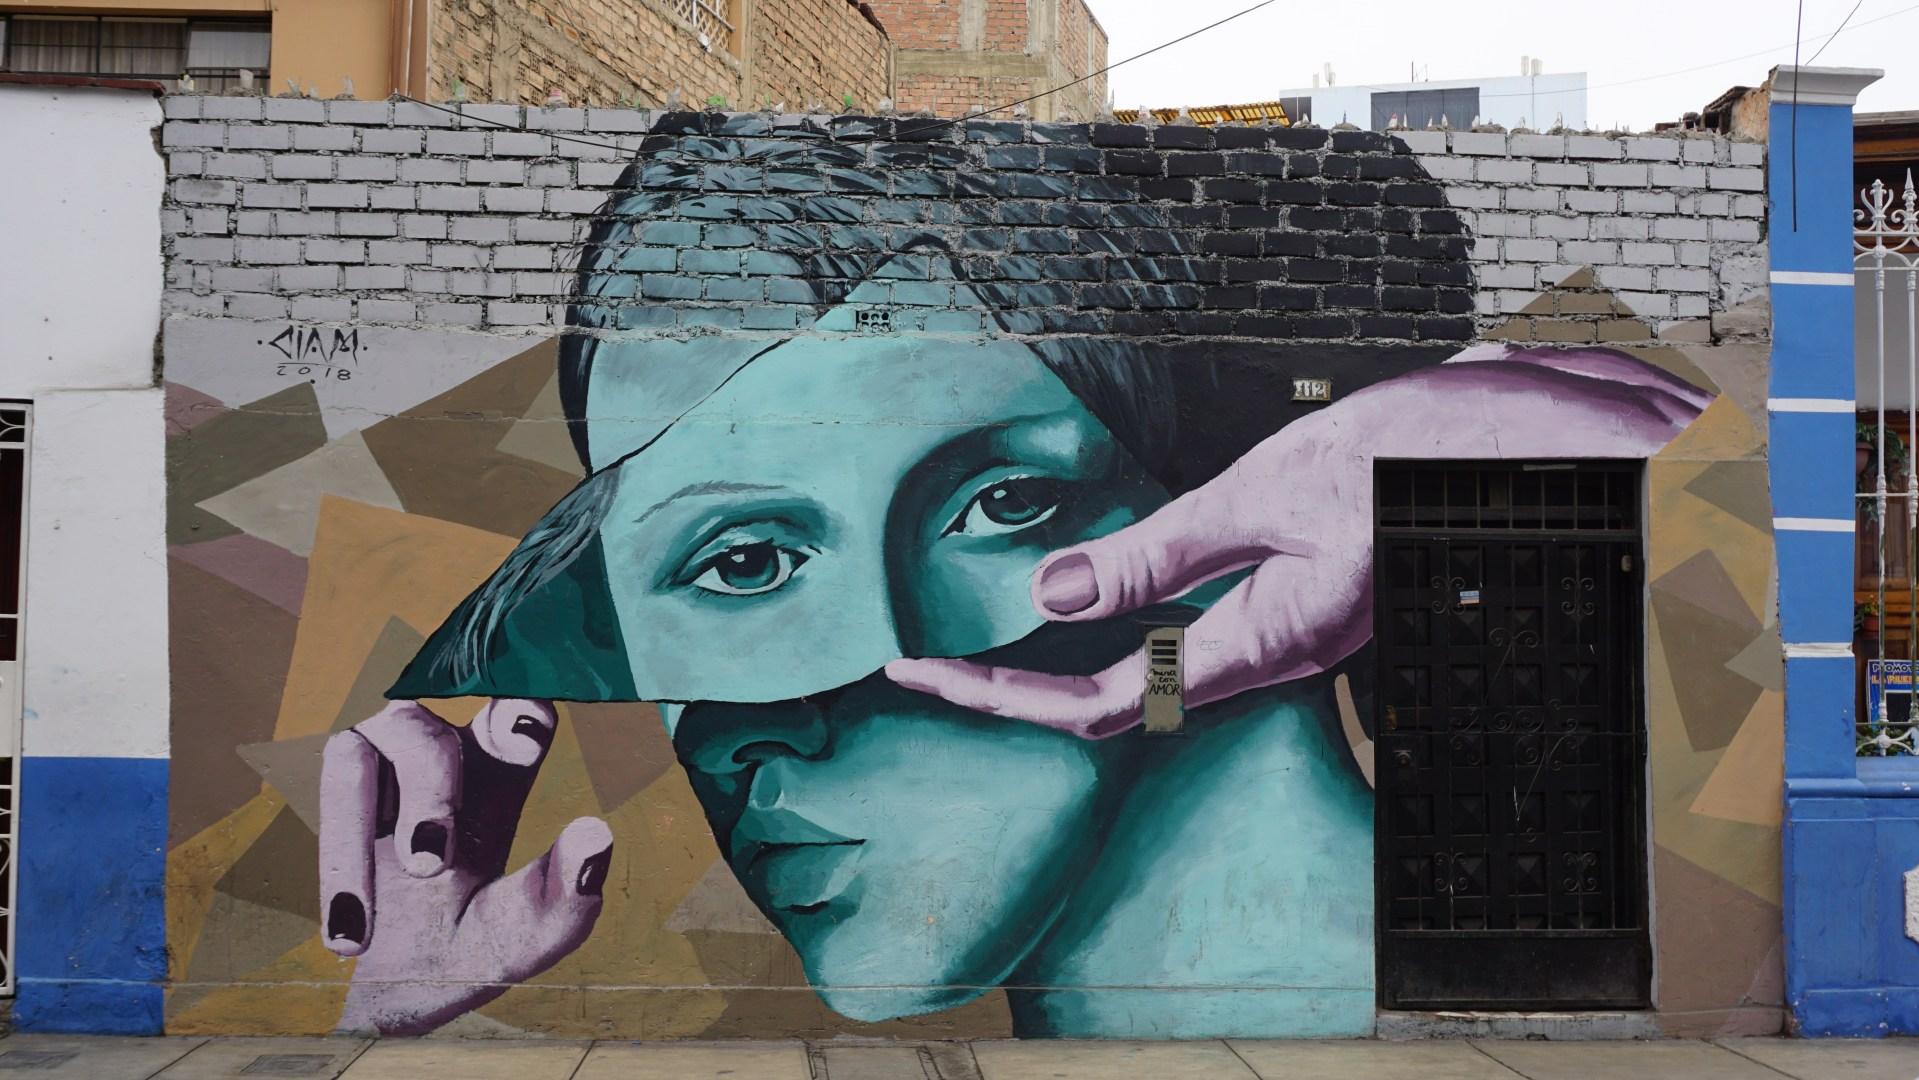 Lima - Mural dans Barranco